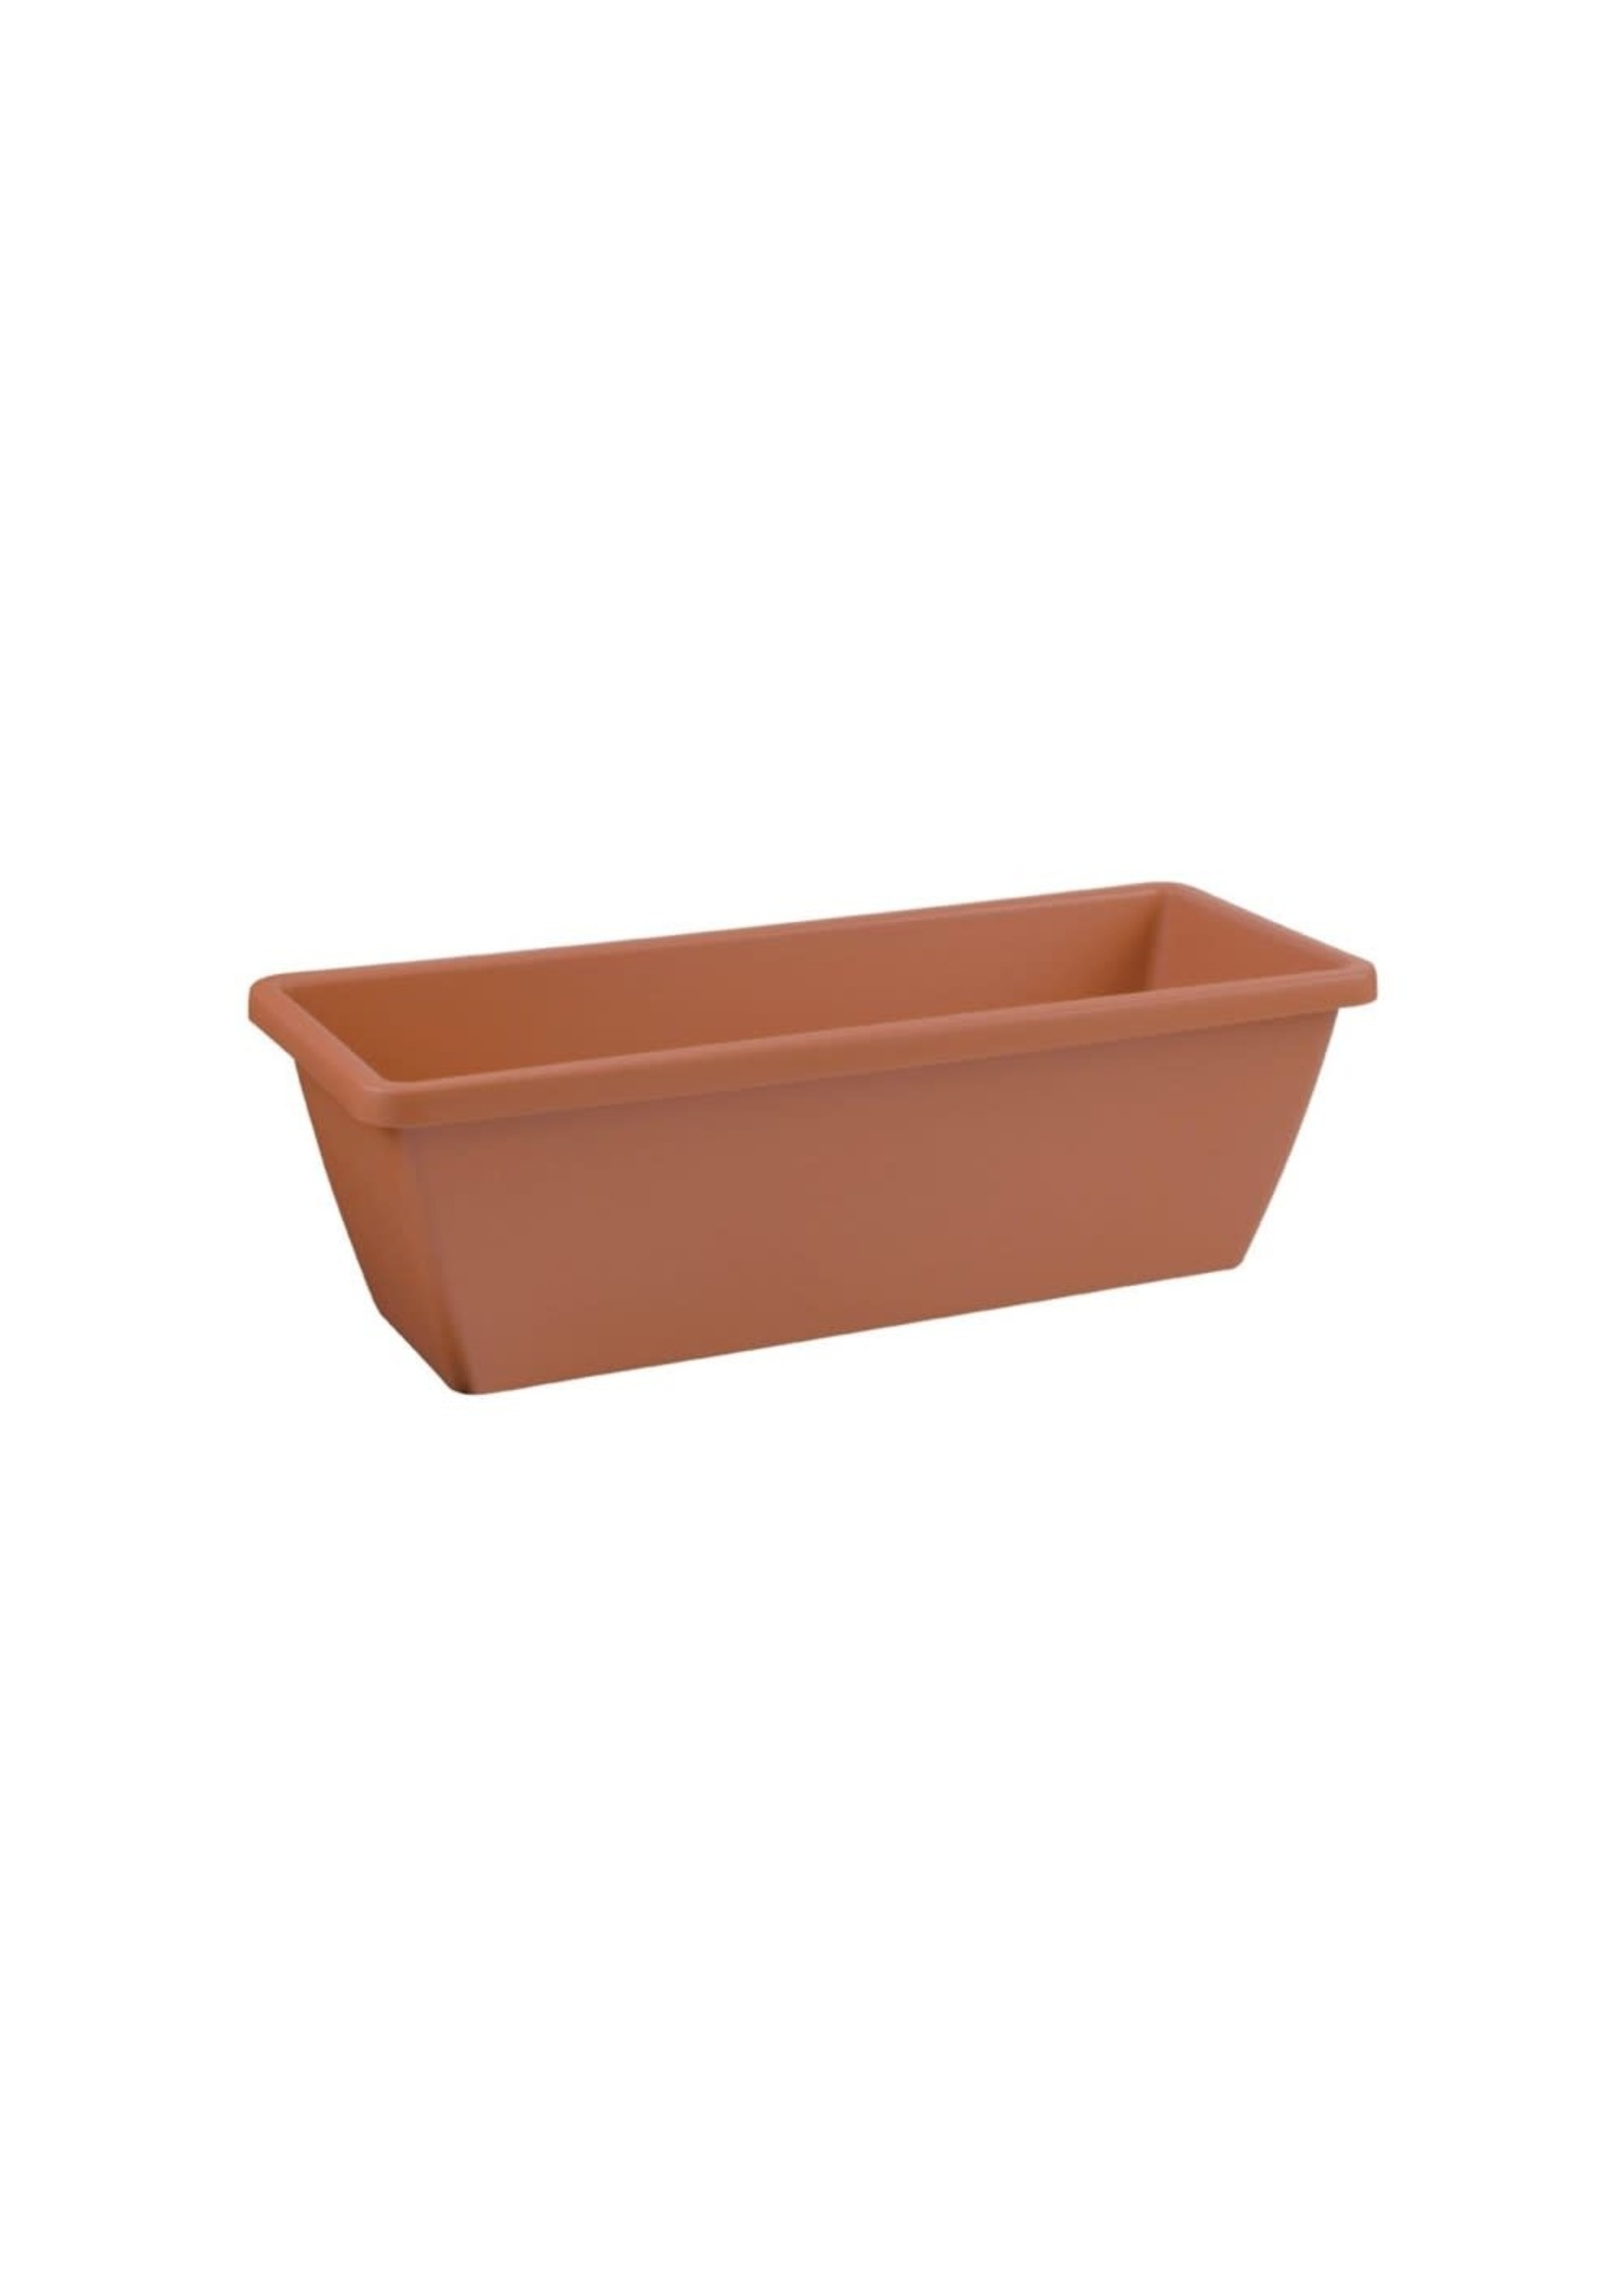 Elho Green Basics trough 50cm Terracotta